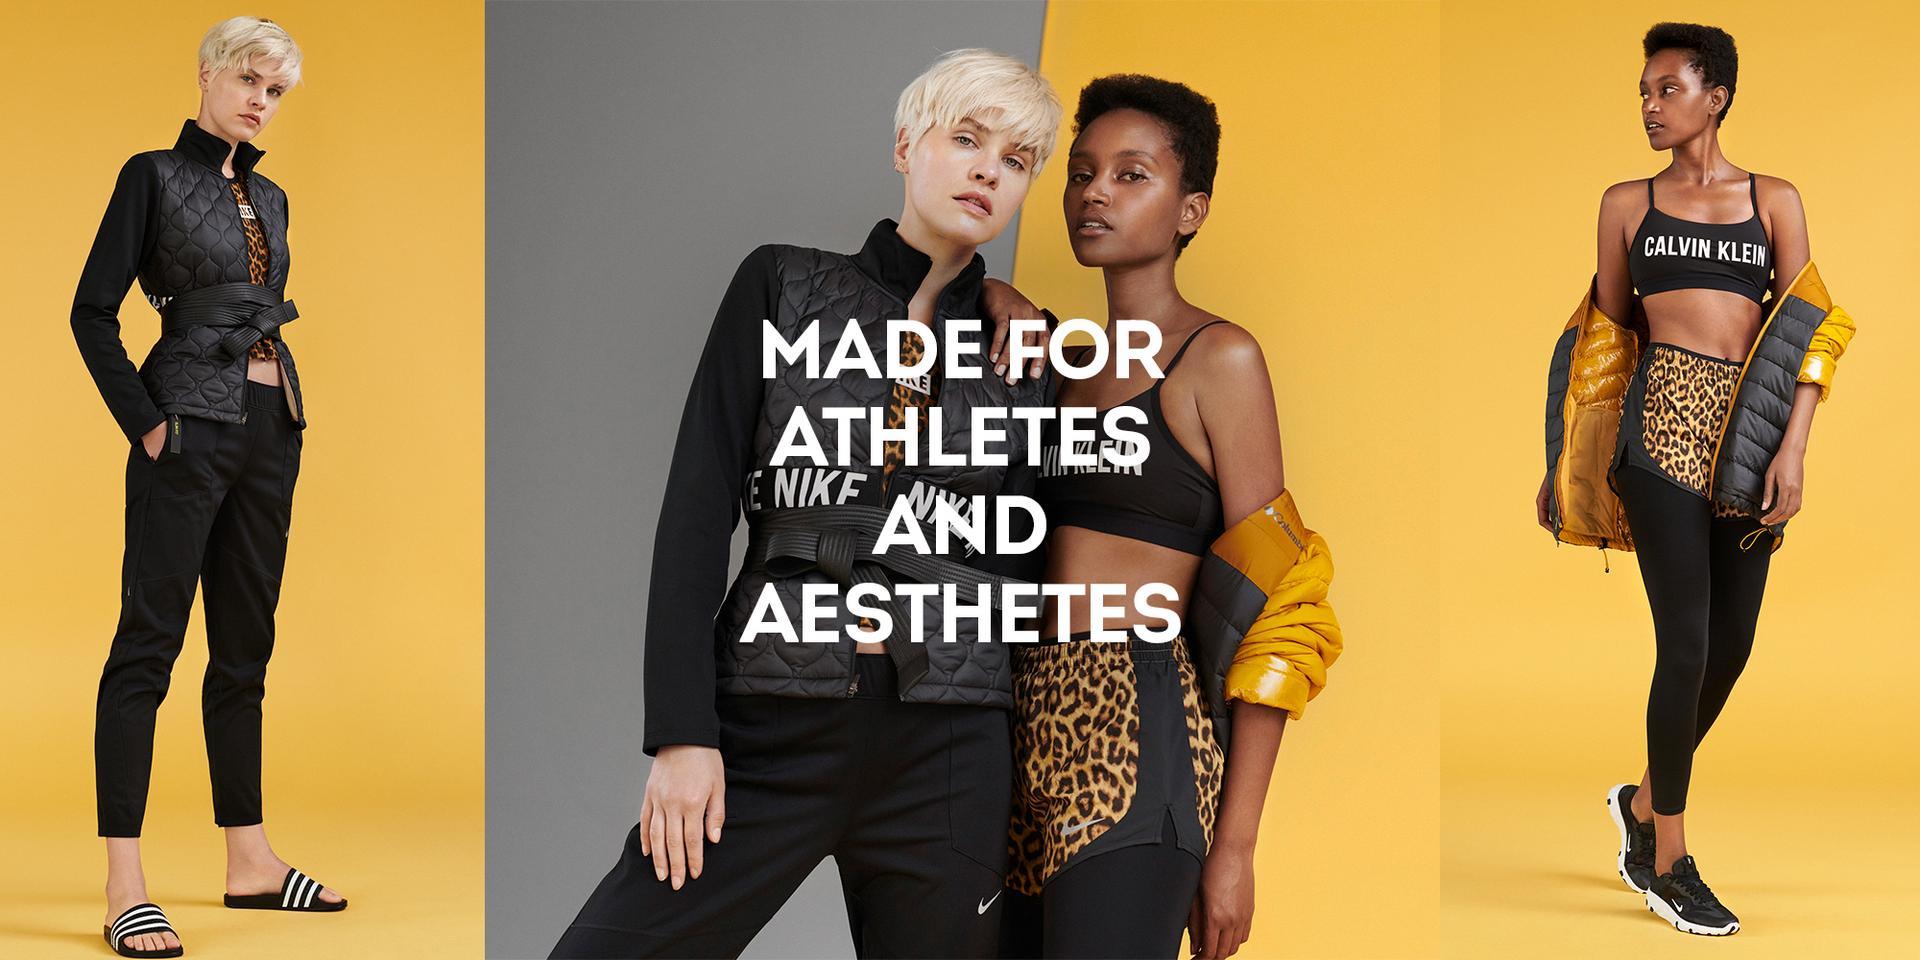 timeless design 8dc5c d2694 Sportartikel, Sportbekleidung und Sportschuhe jetzt bei ...